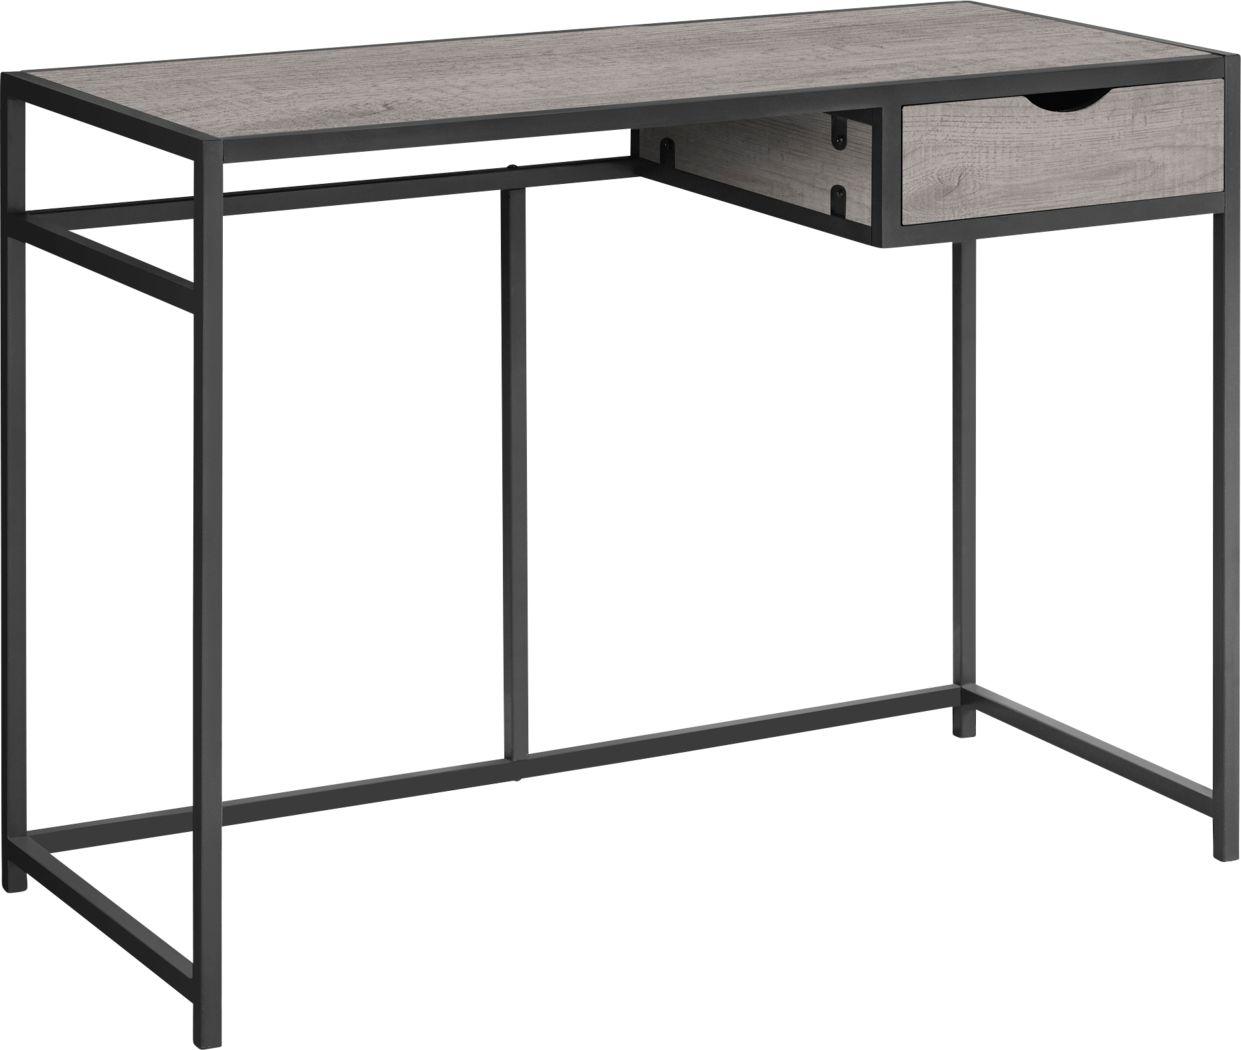 Dexired Gray Desk